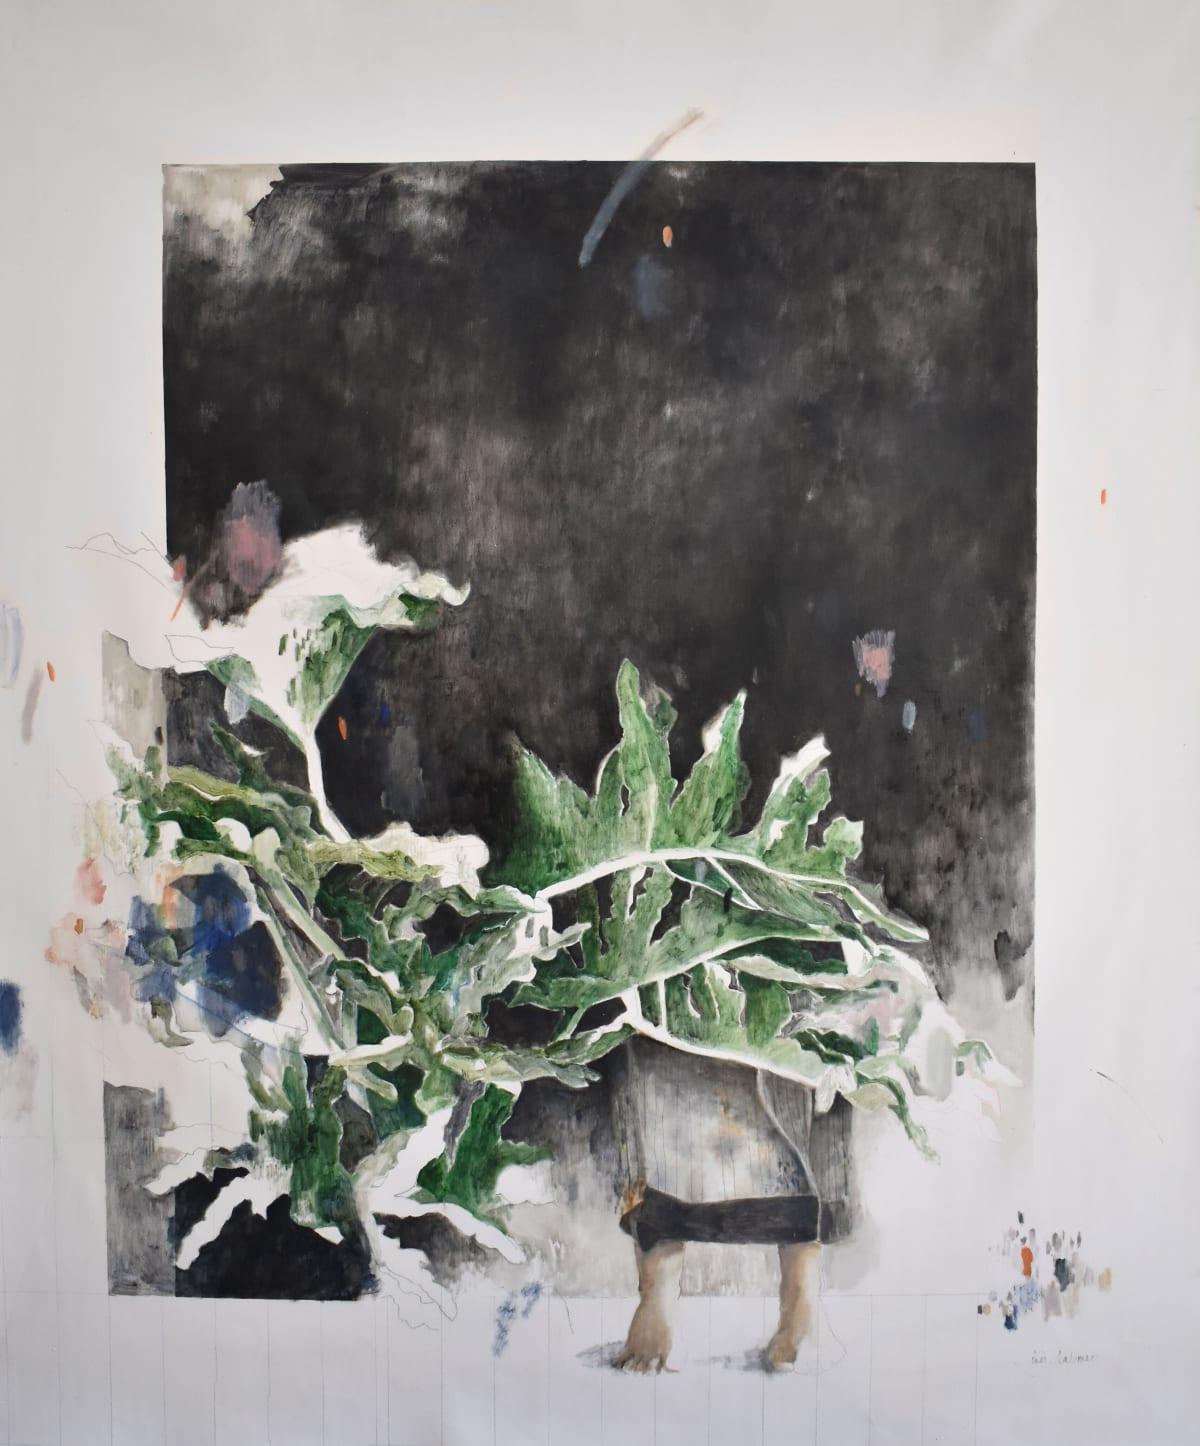 Ines Katamso, Contemplation 4, 2019